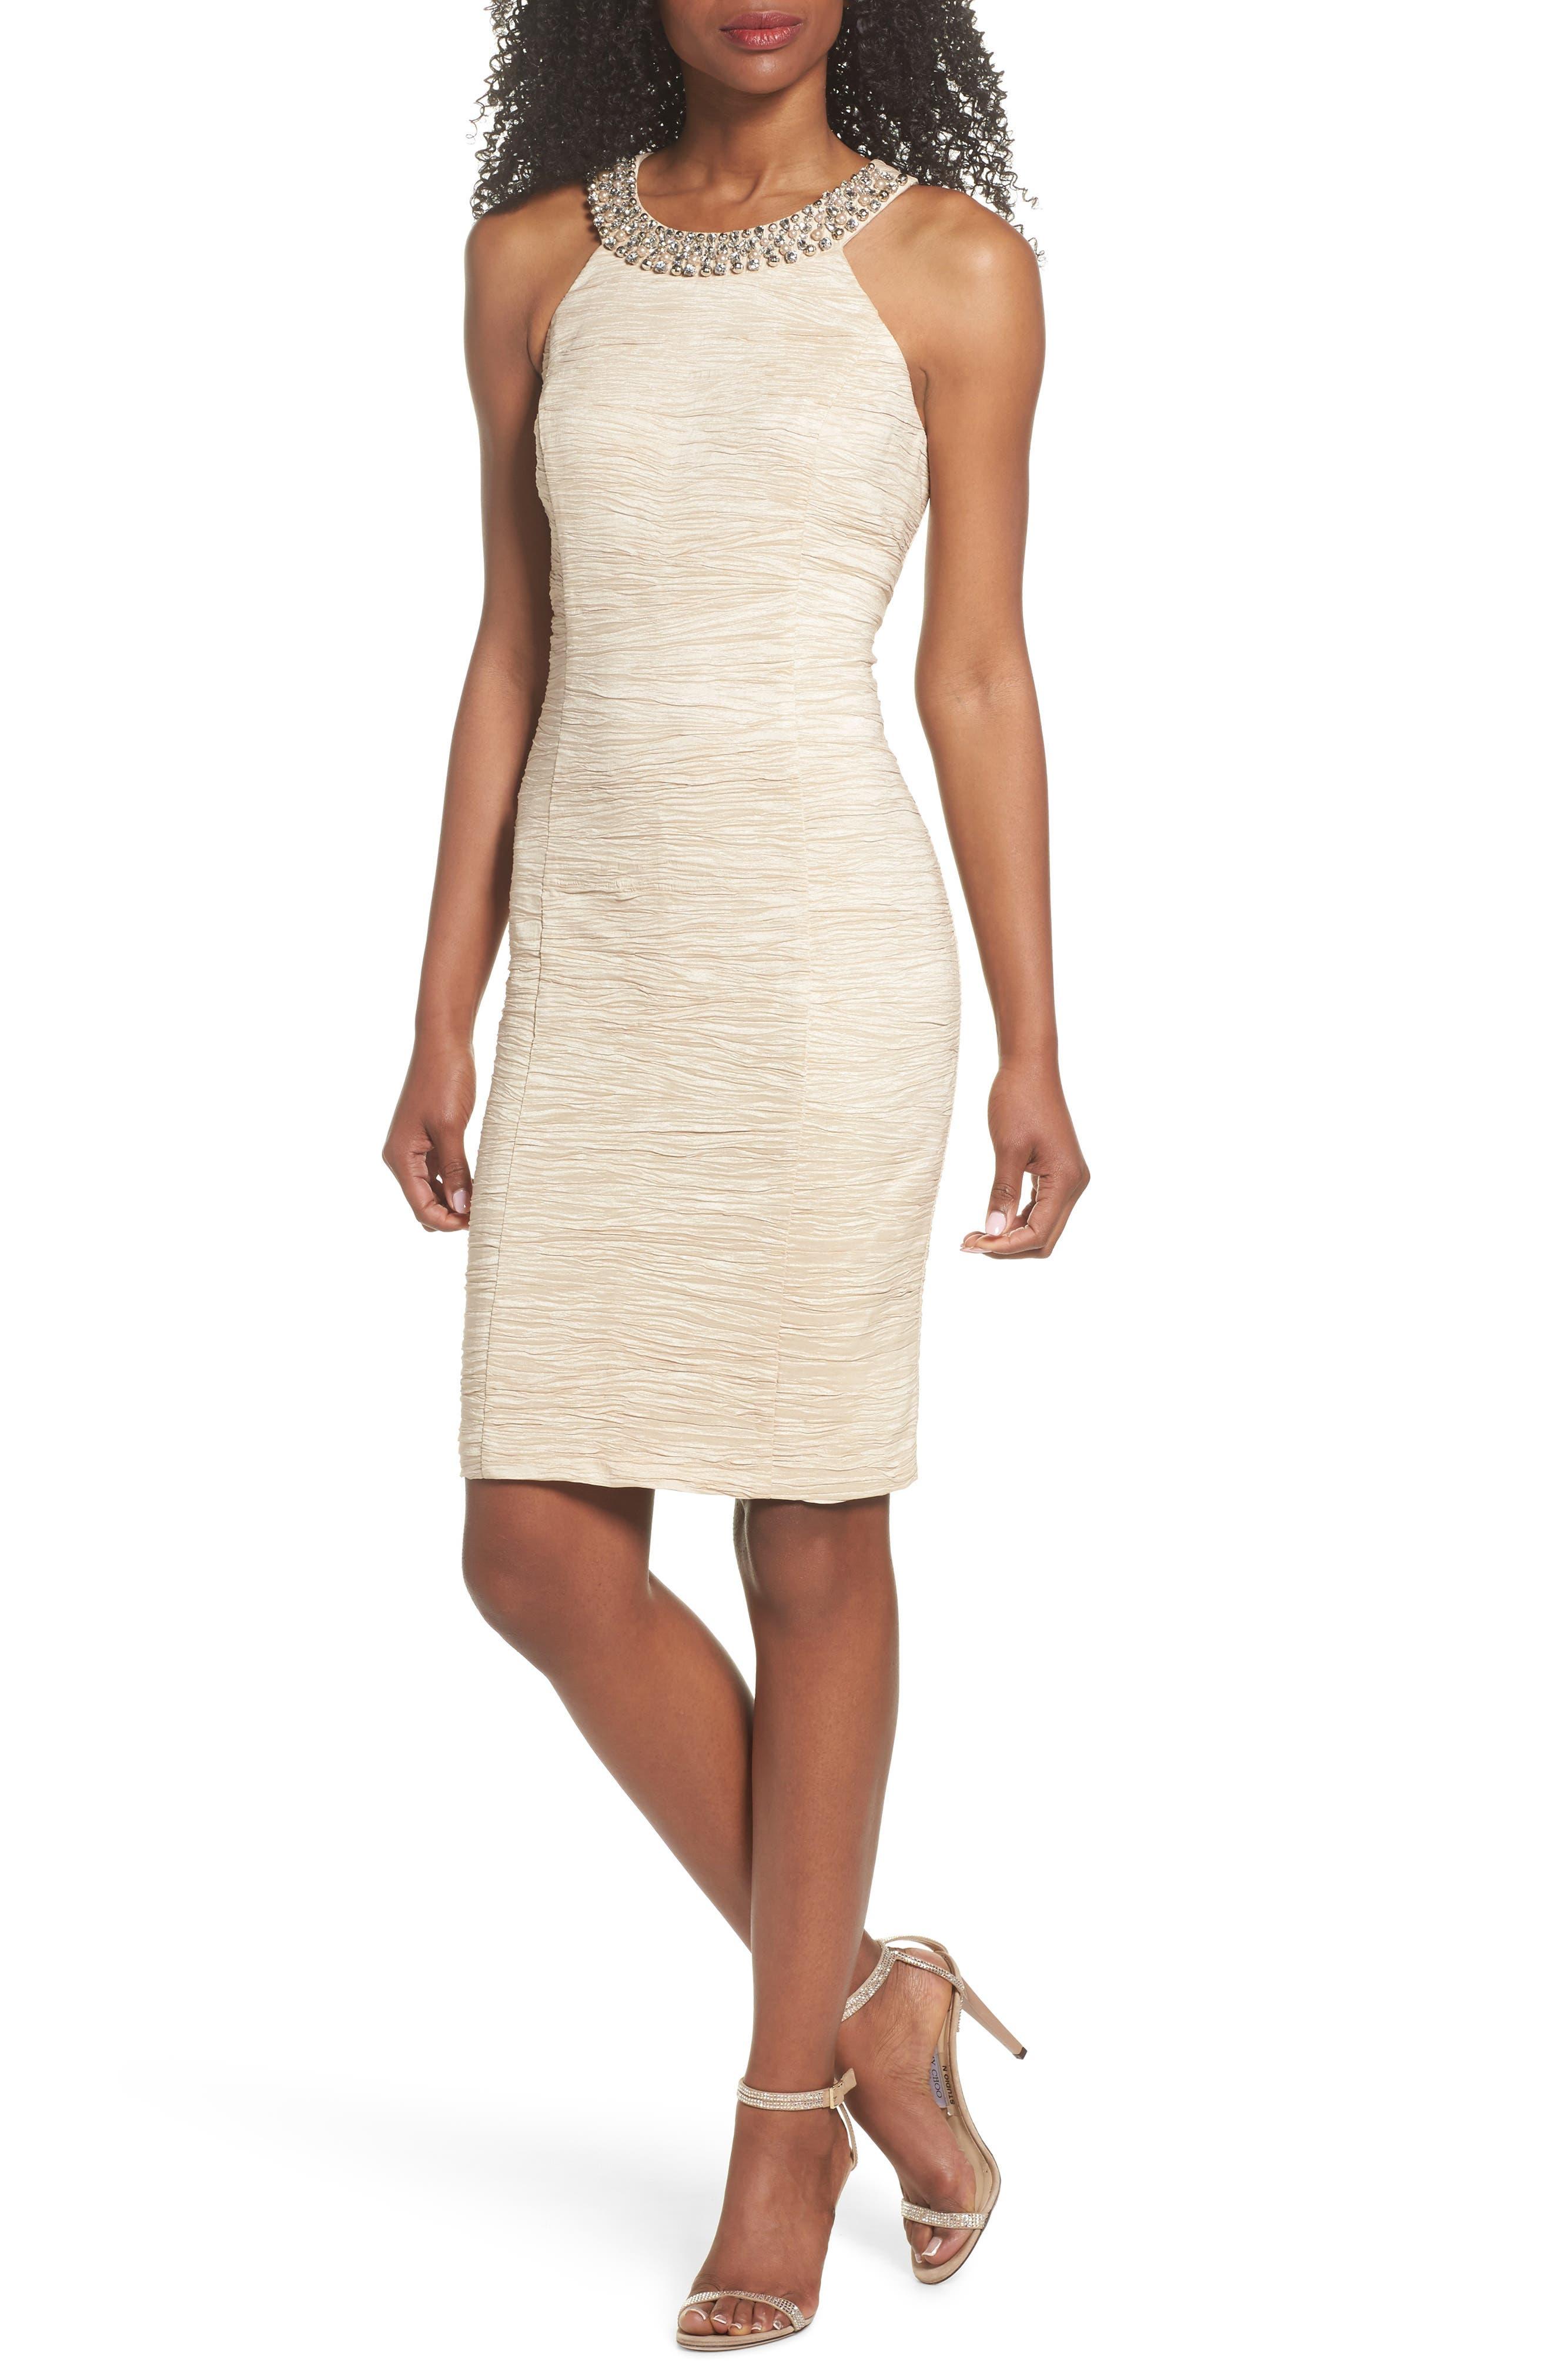 Embellished Crushed Taffeta Sheath Dress,                         Main,                         color, 250